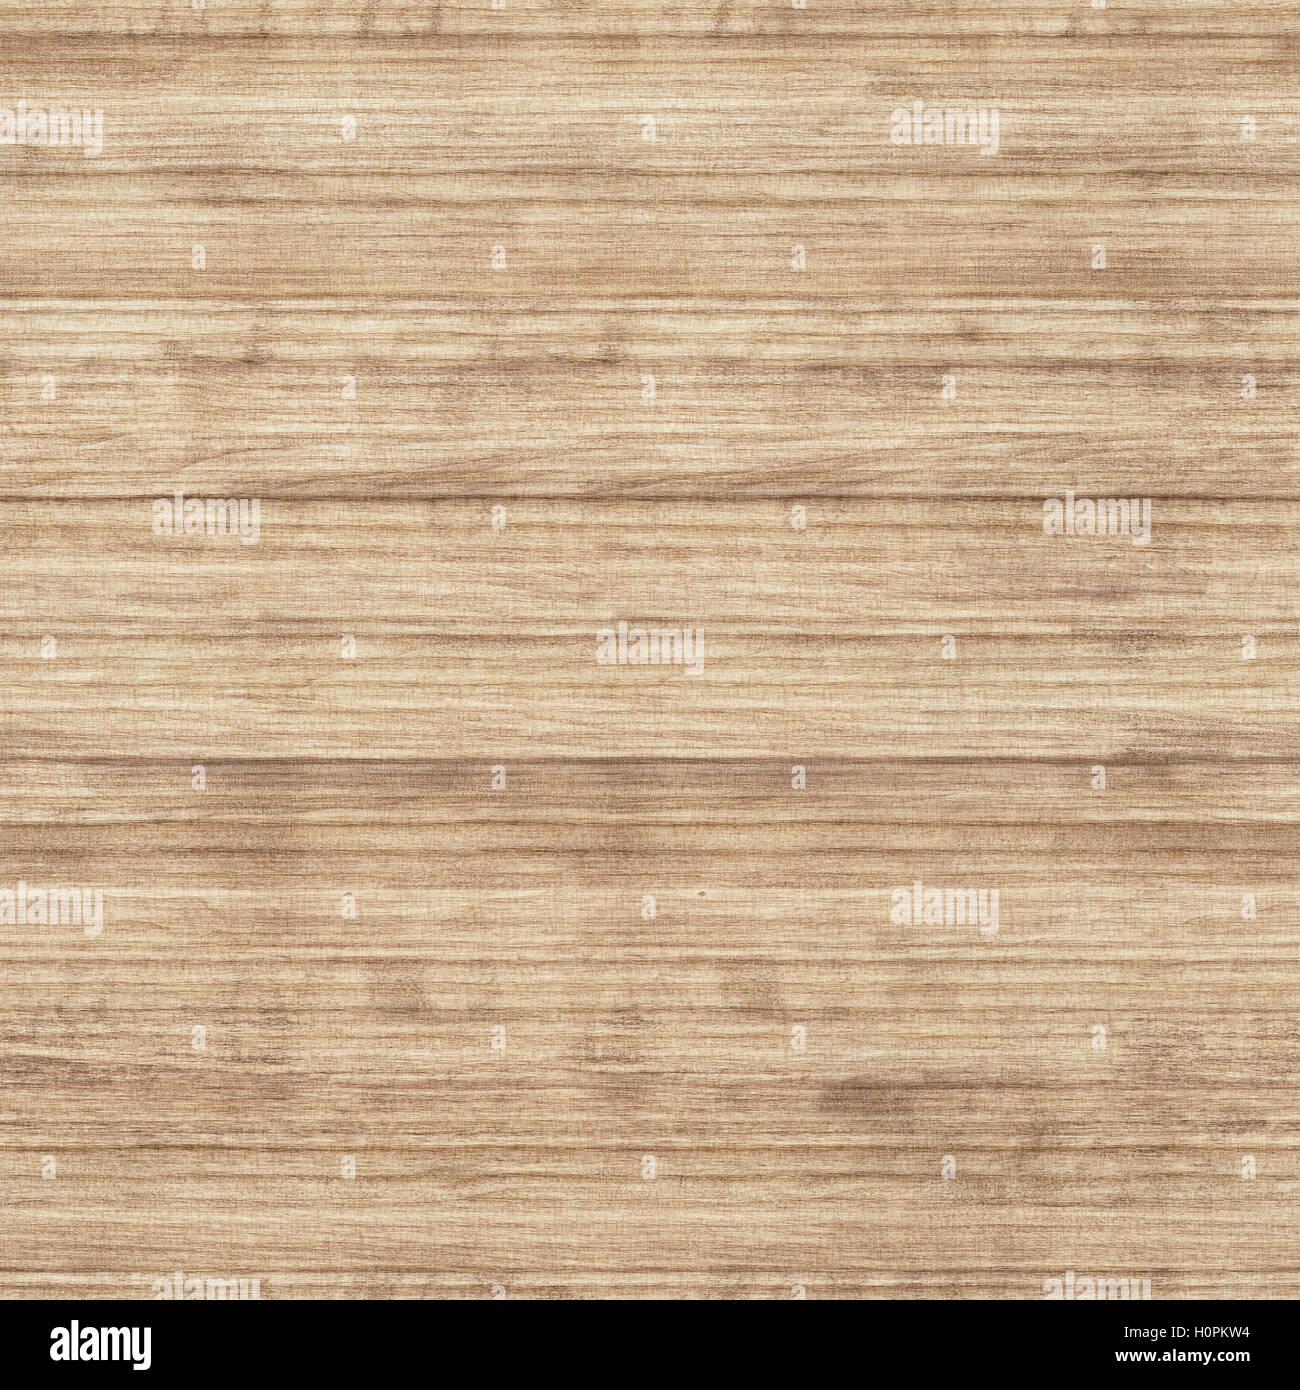 Seamless Texture Light Wood Background